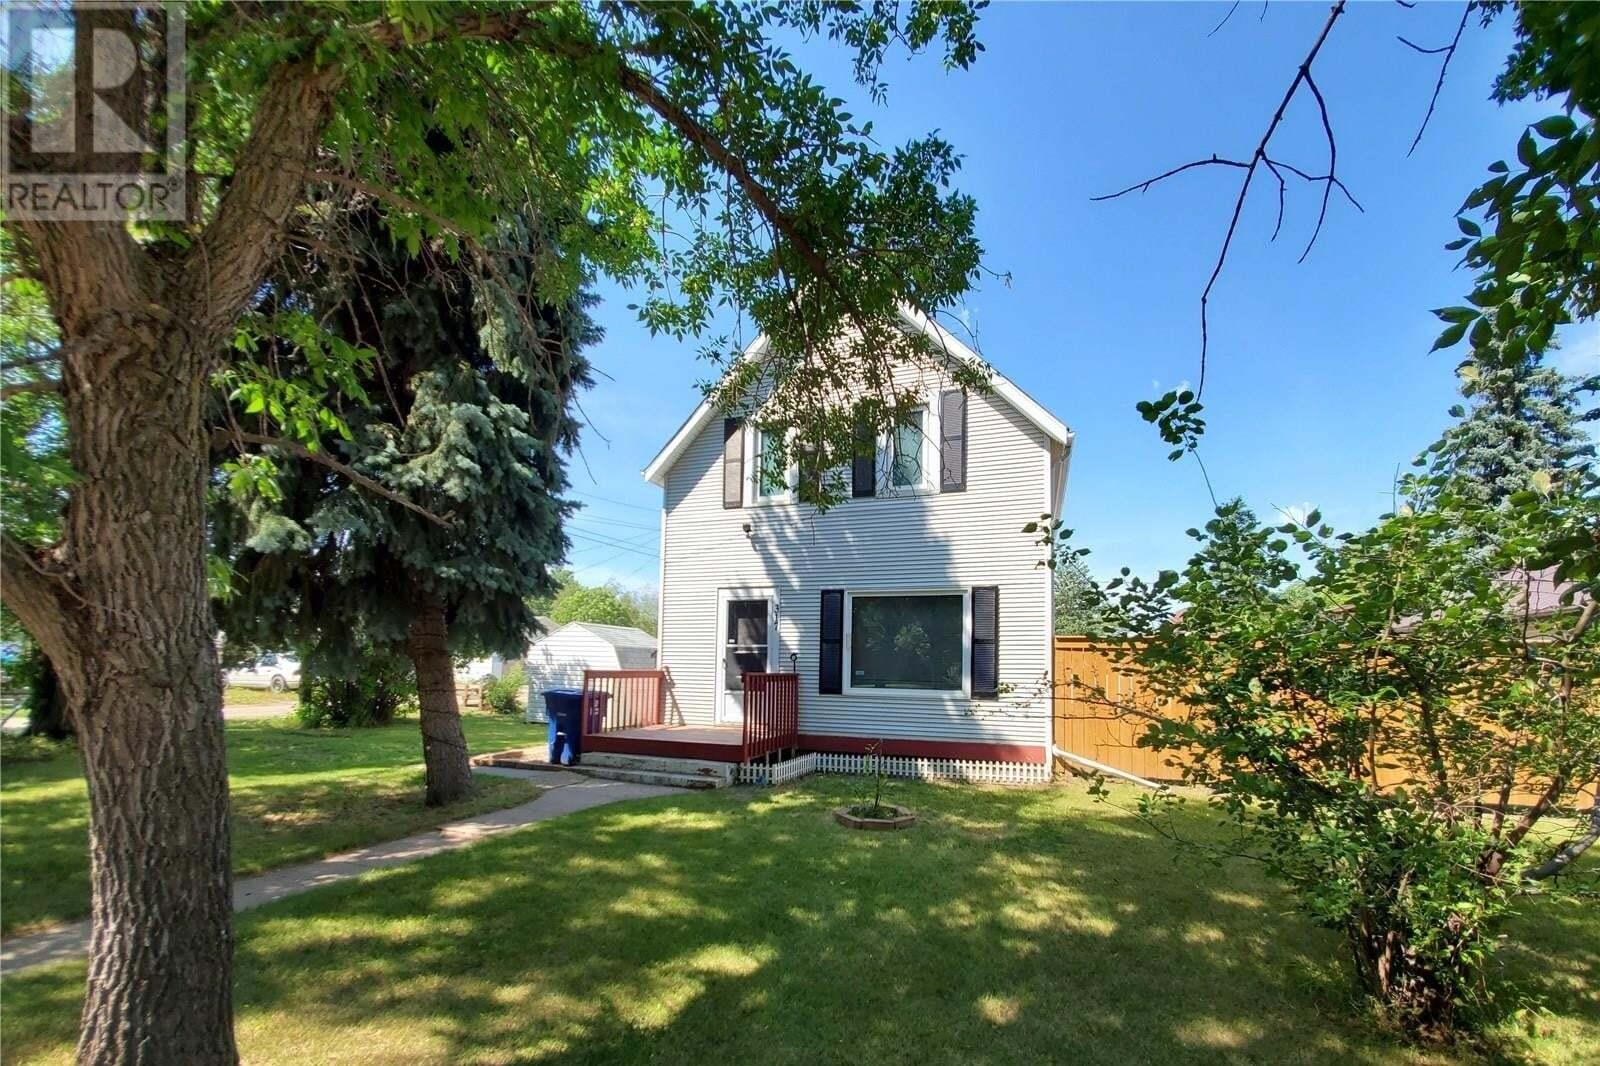 House for sale at 317 1st St E Unity Saskatchewan - MLS: SK819462